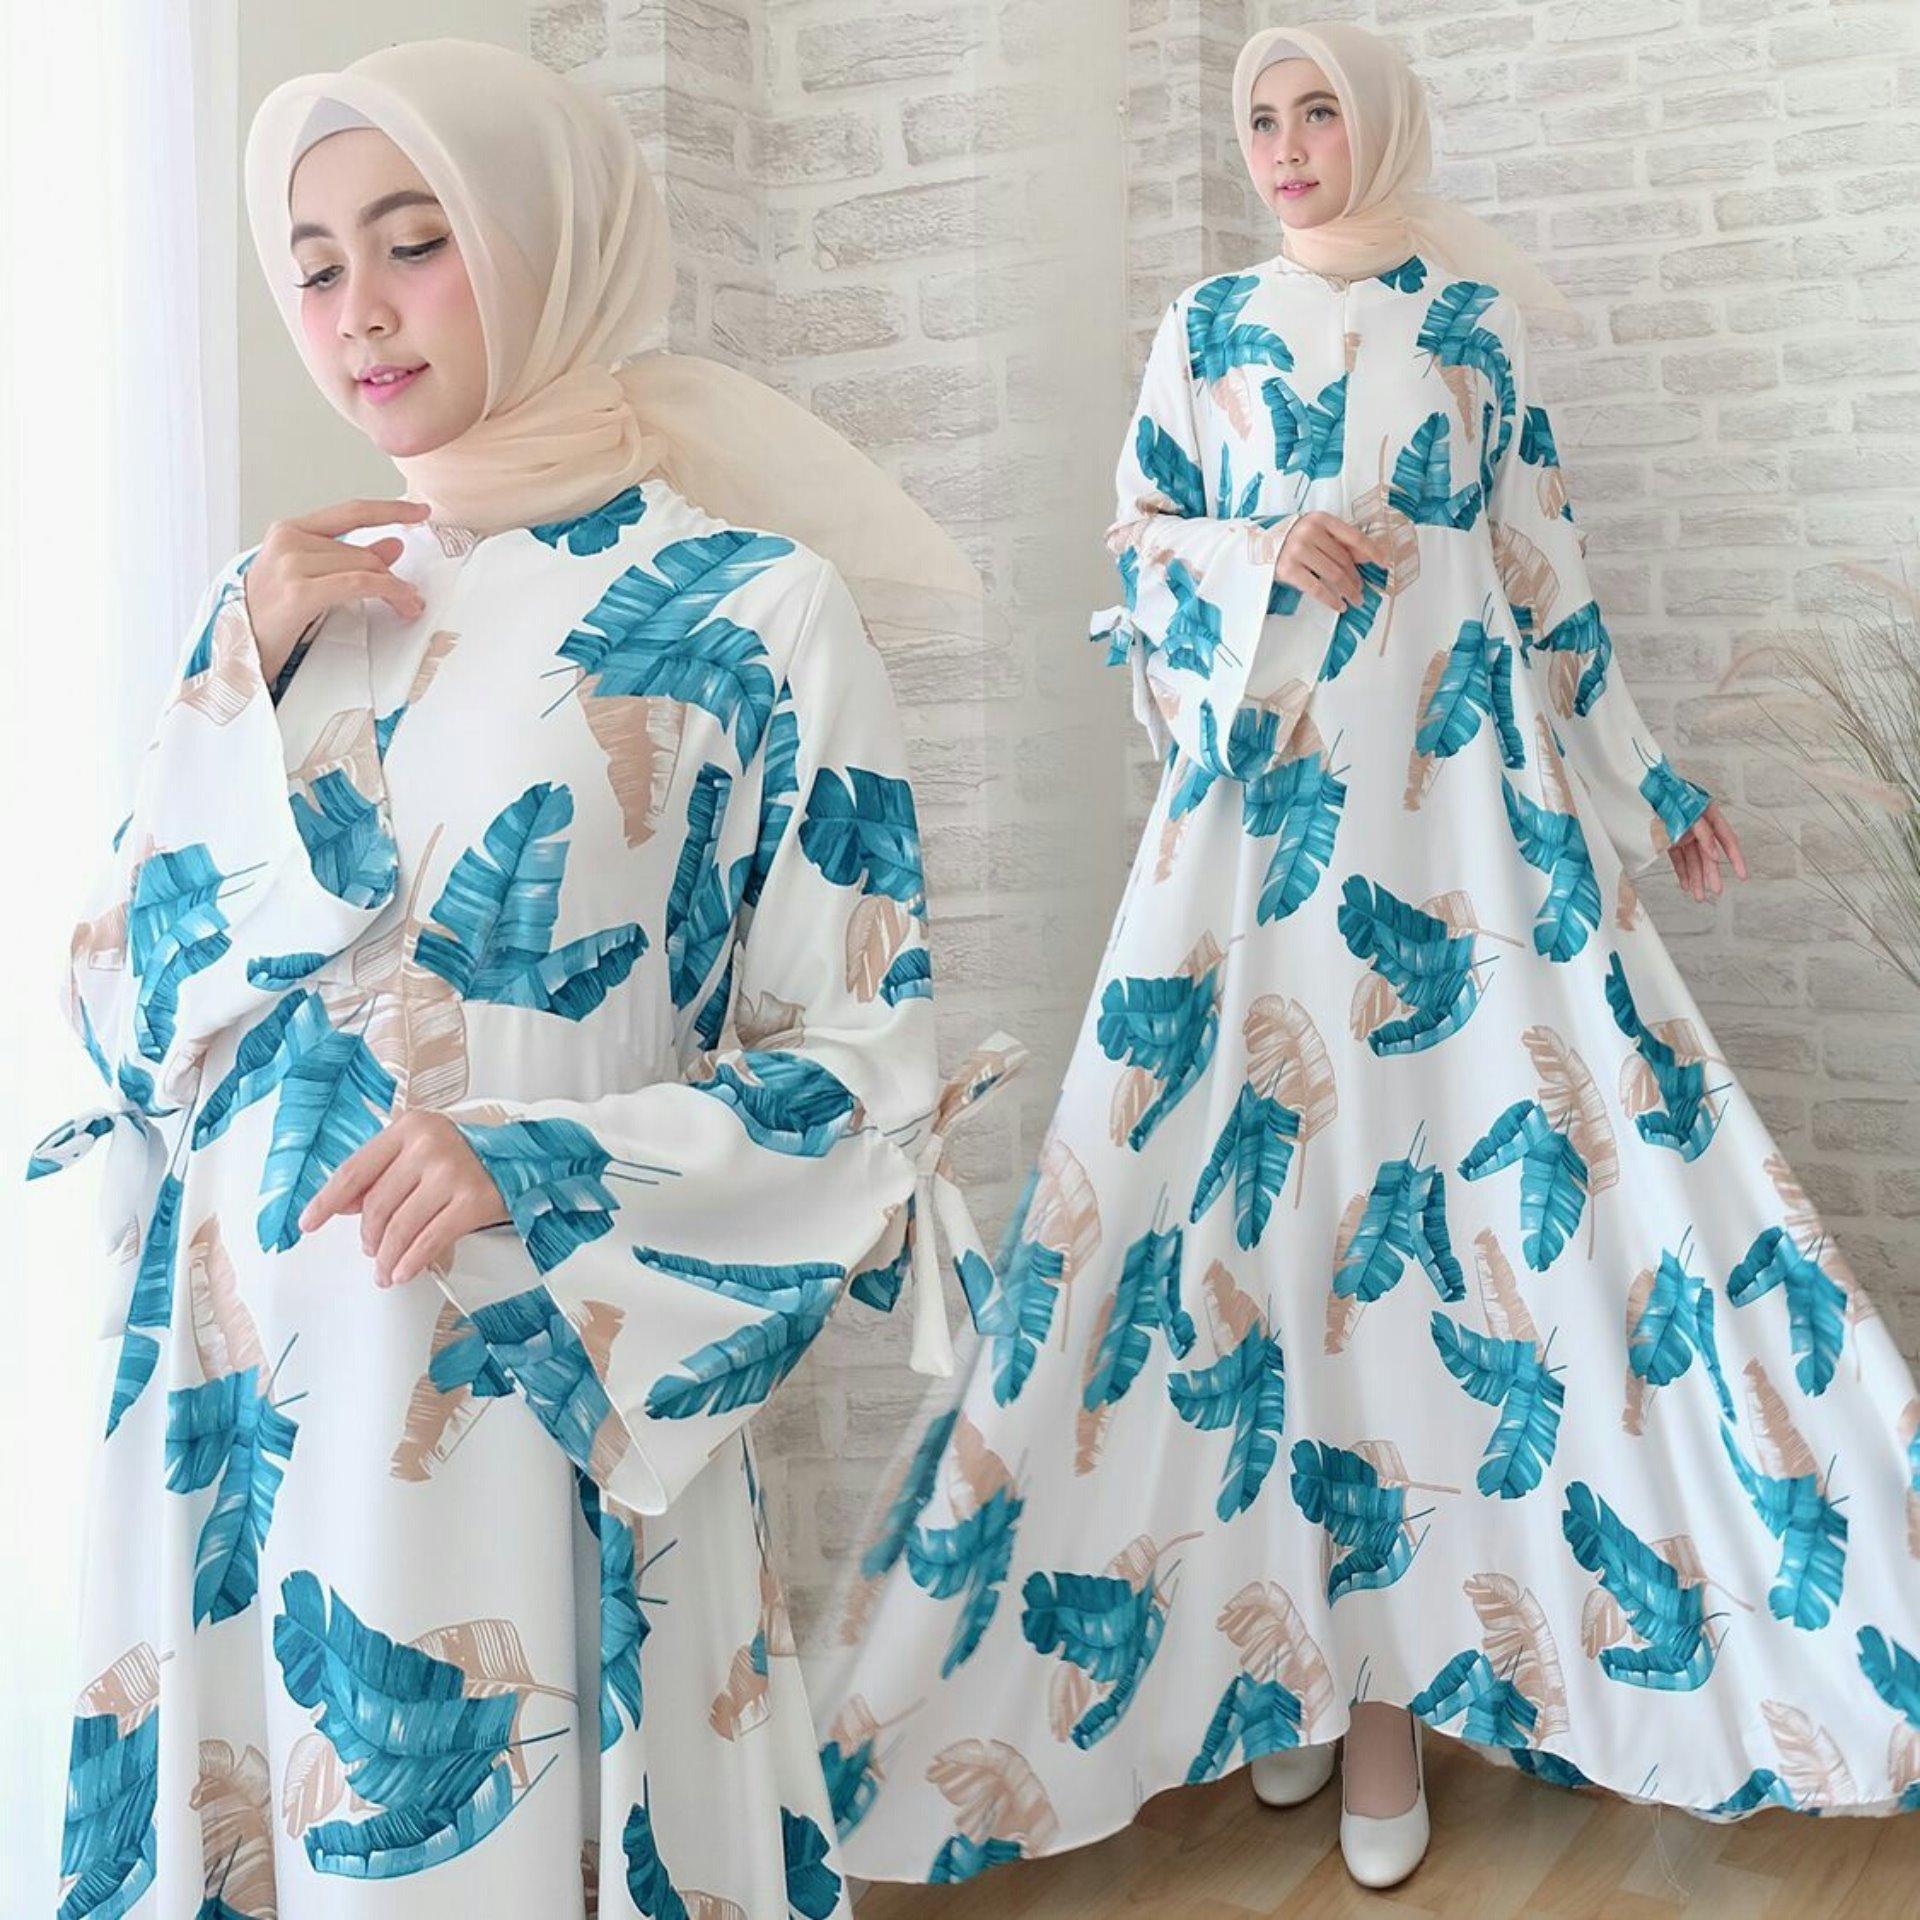 trendshopee Pakaian Muslim Wanita Gamis Maxi Amika